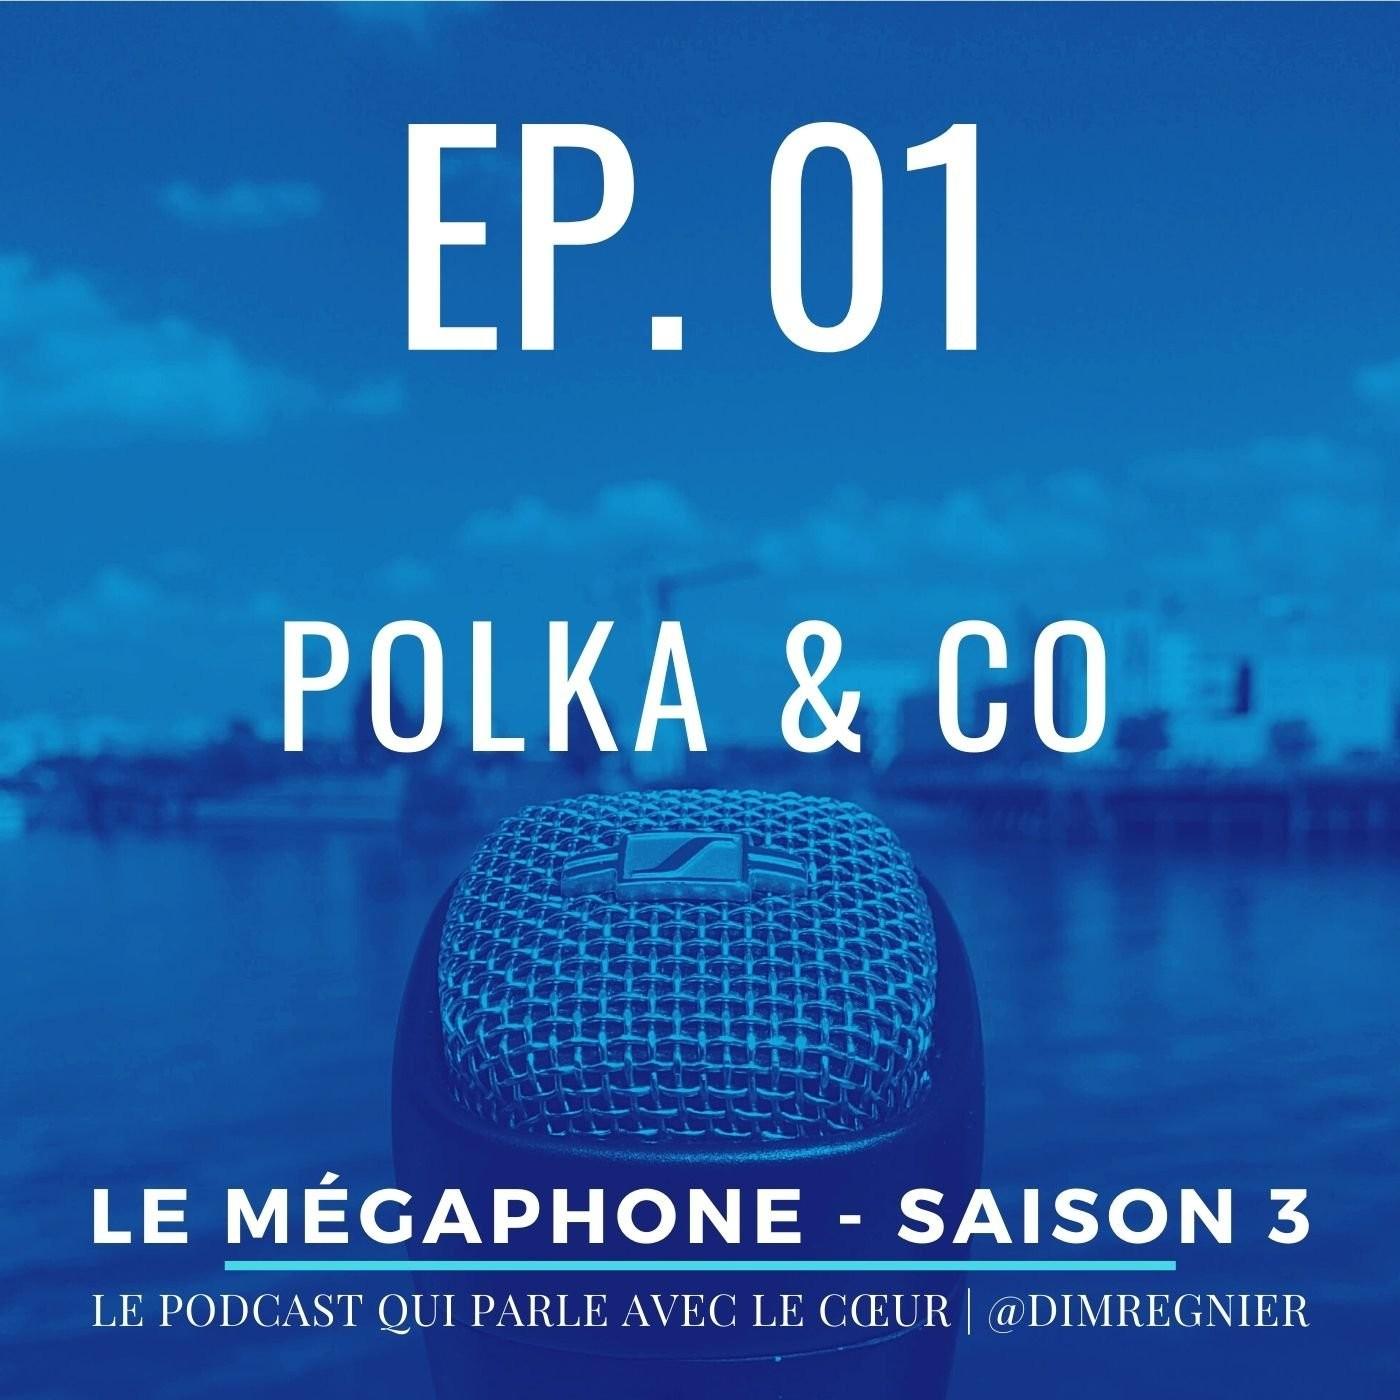 Ép. 01 - Polka and co